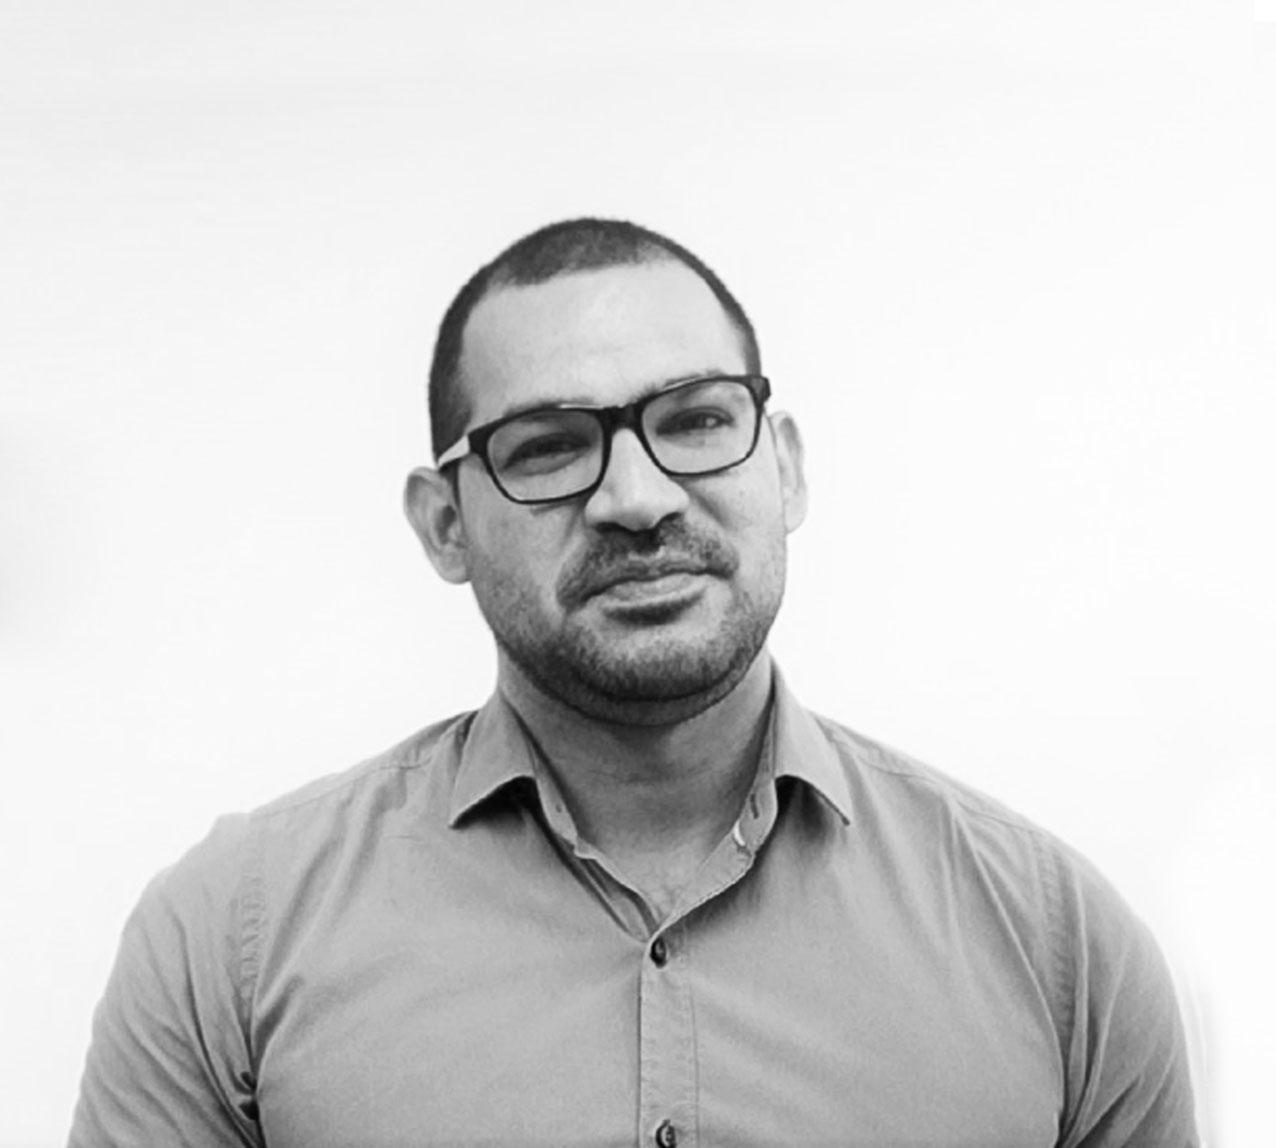 https://suricatalabs.com/wp-content/uploads/2020/04/jose-ricardo-yancy.jpg